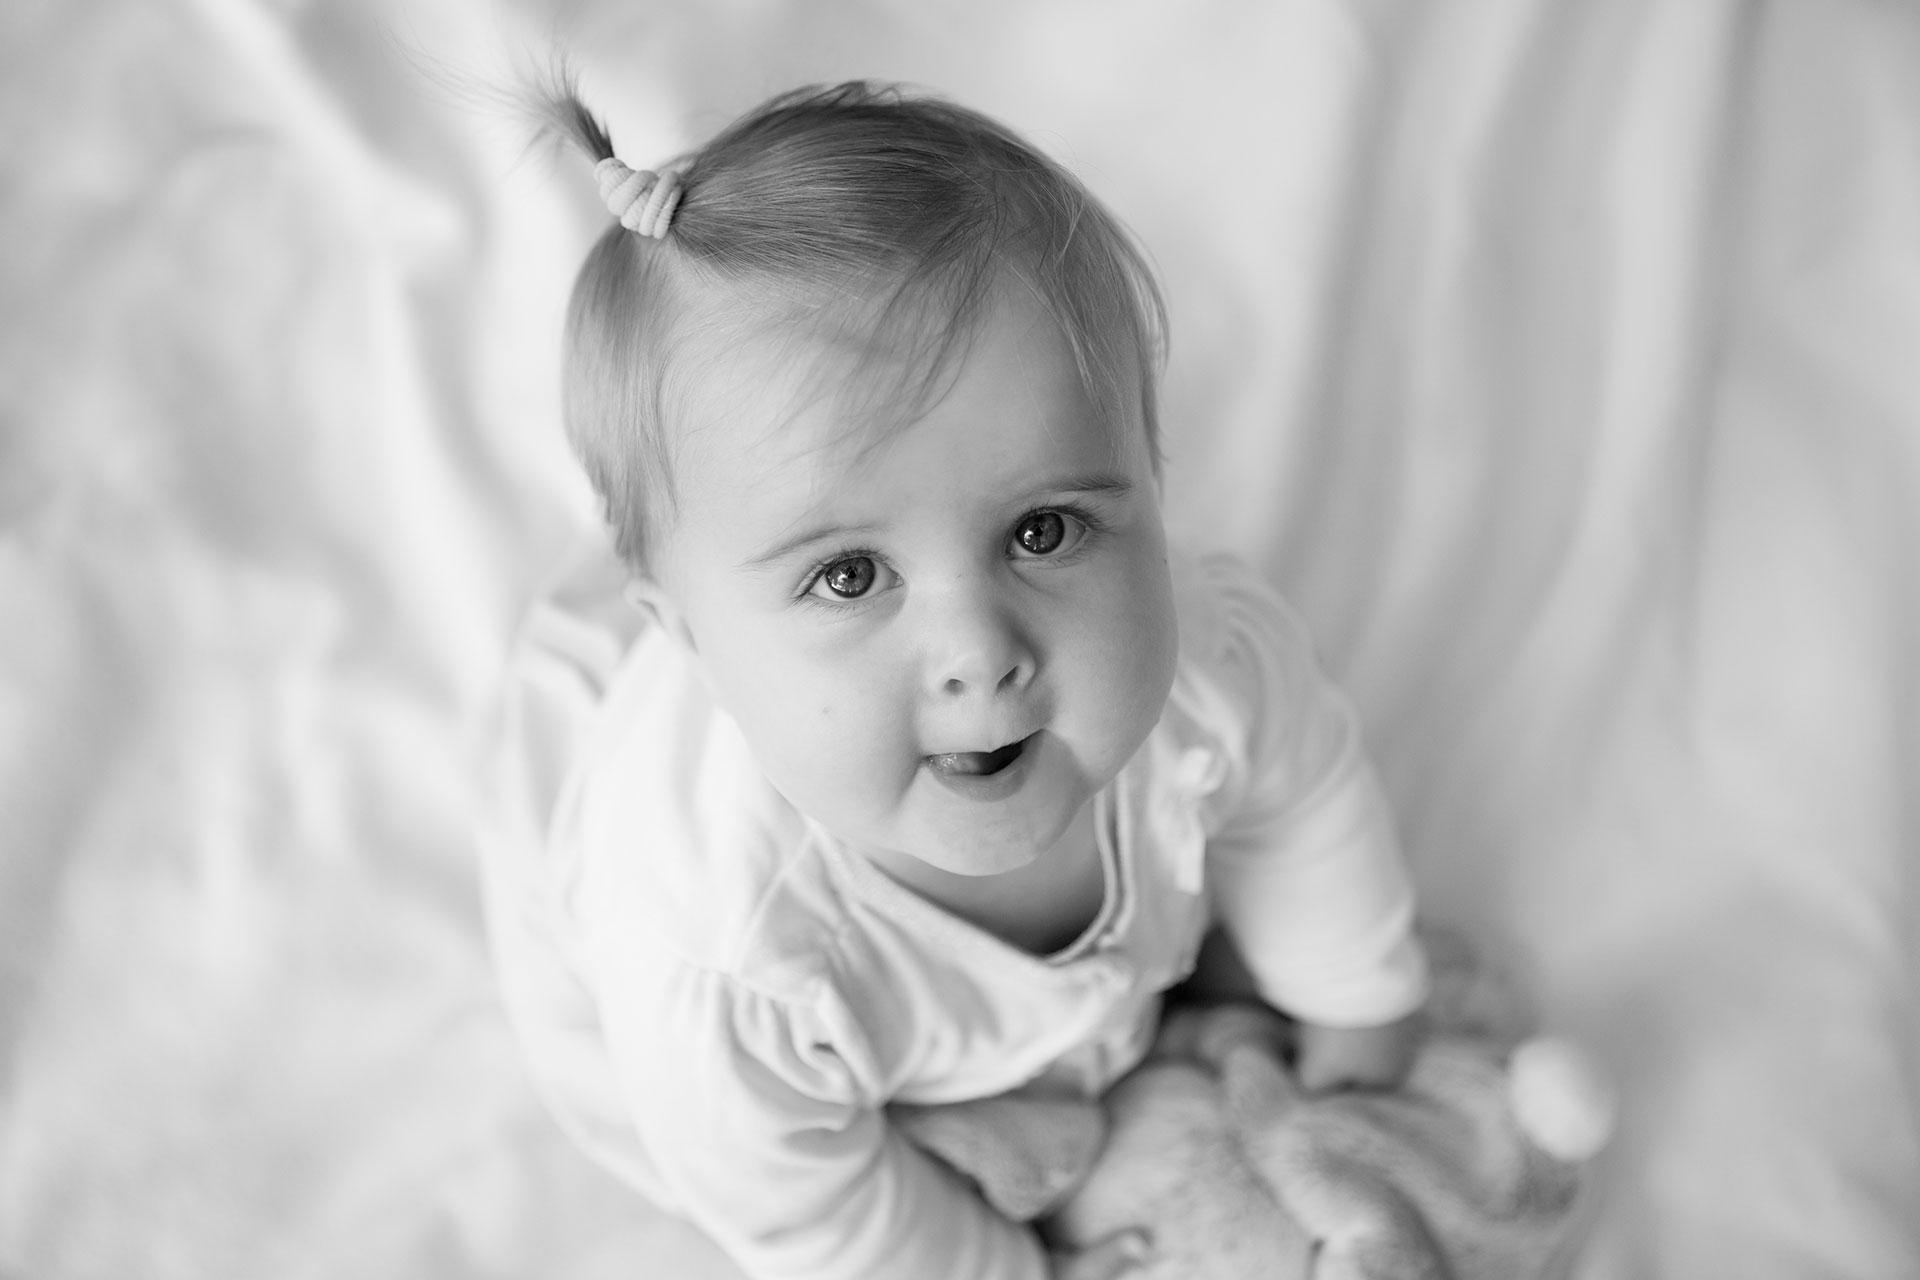 particuliers-portraits-magaliguillaumeangeeden-2017-22